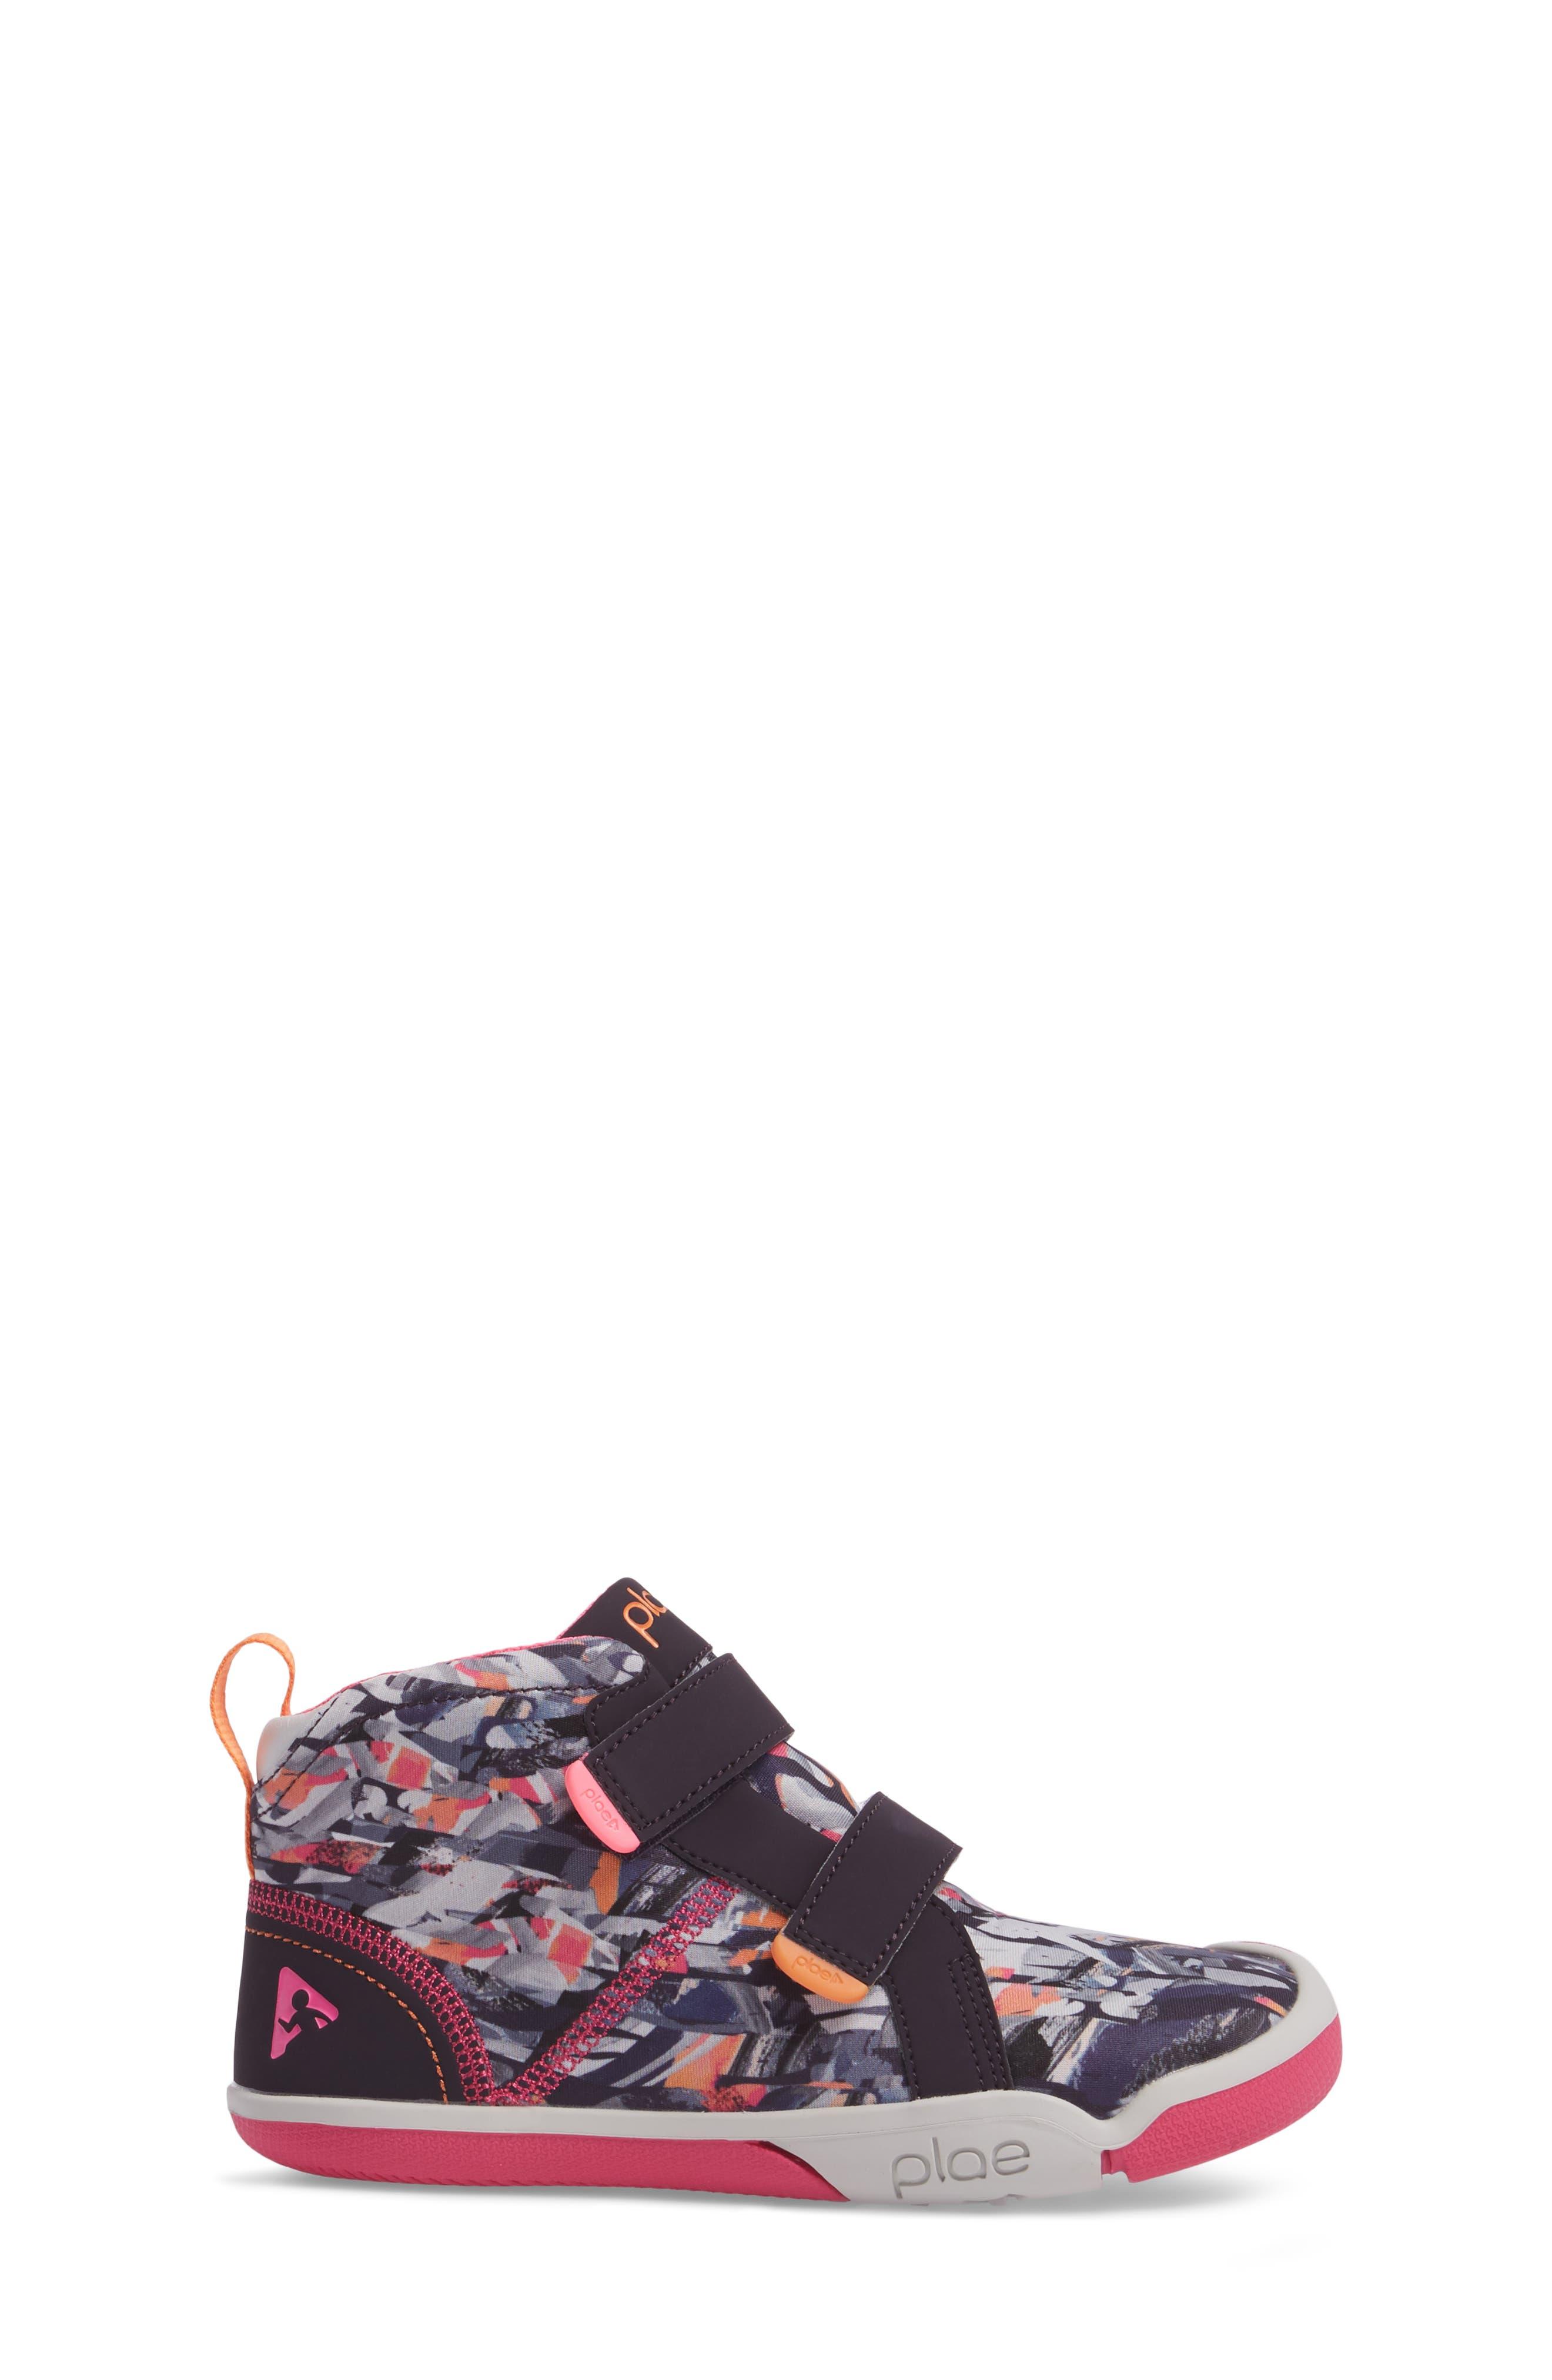 Max Customizable Mid Top Sneaker,                             Alternate thumbnail 3, color,                             503